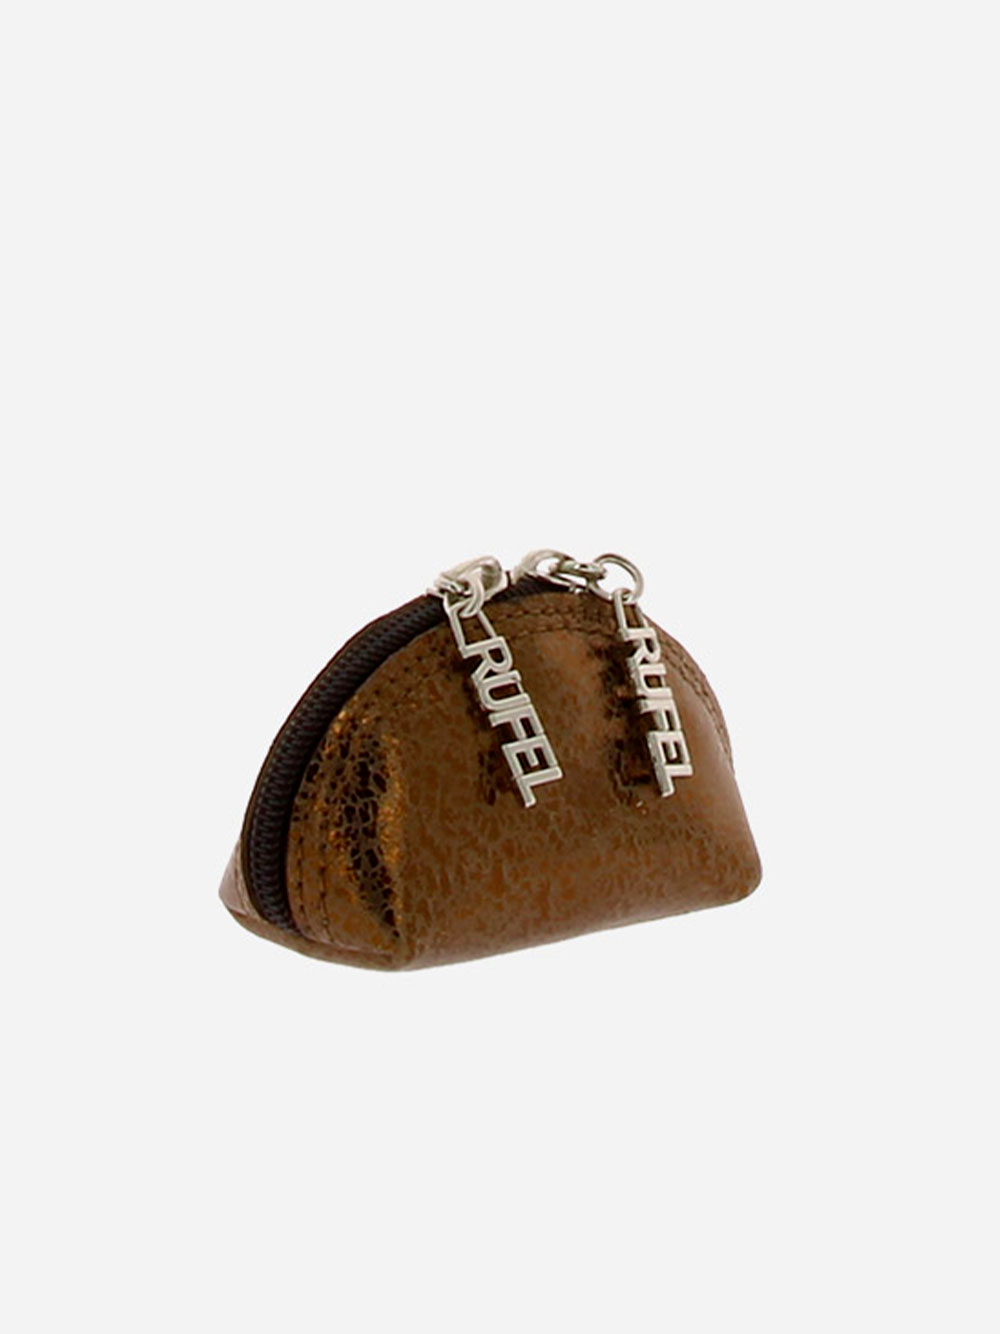 Small Round Toiletry Bag Bronze